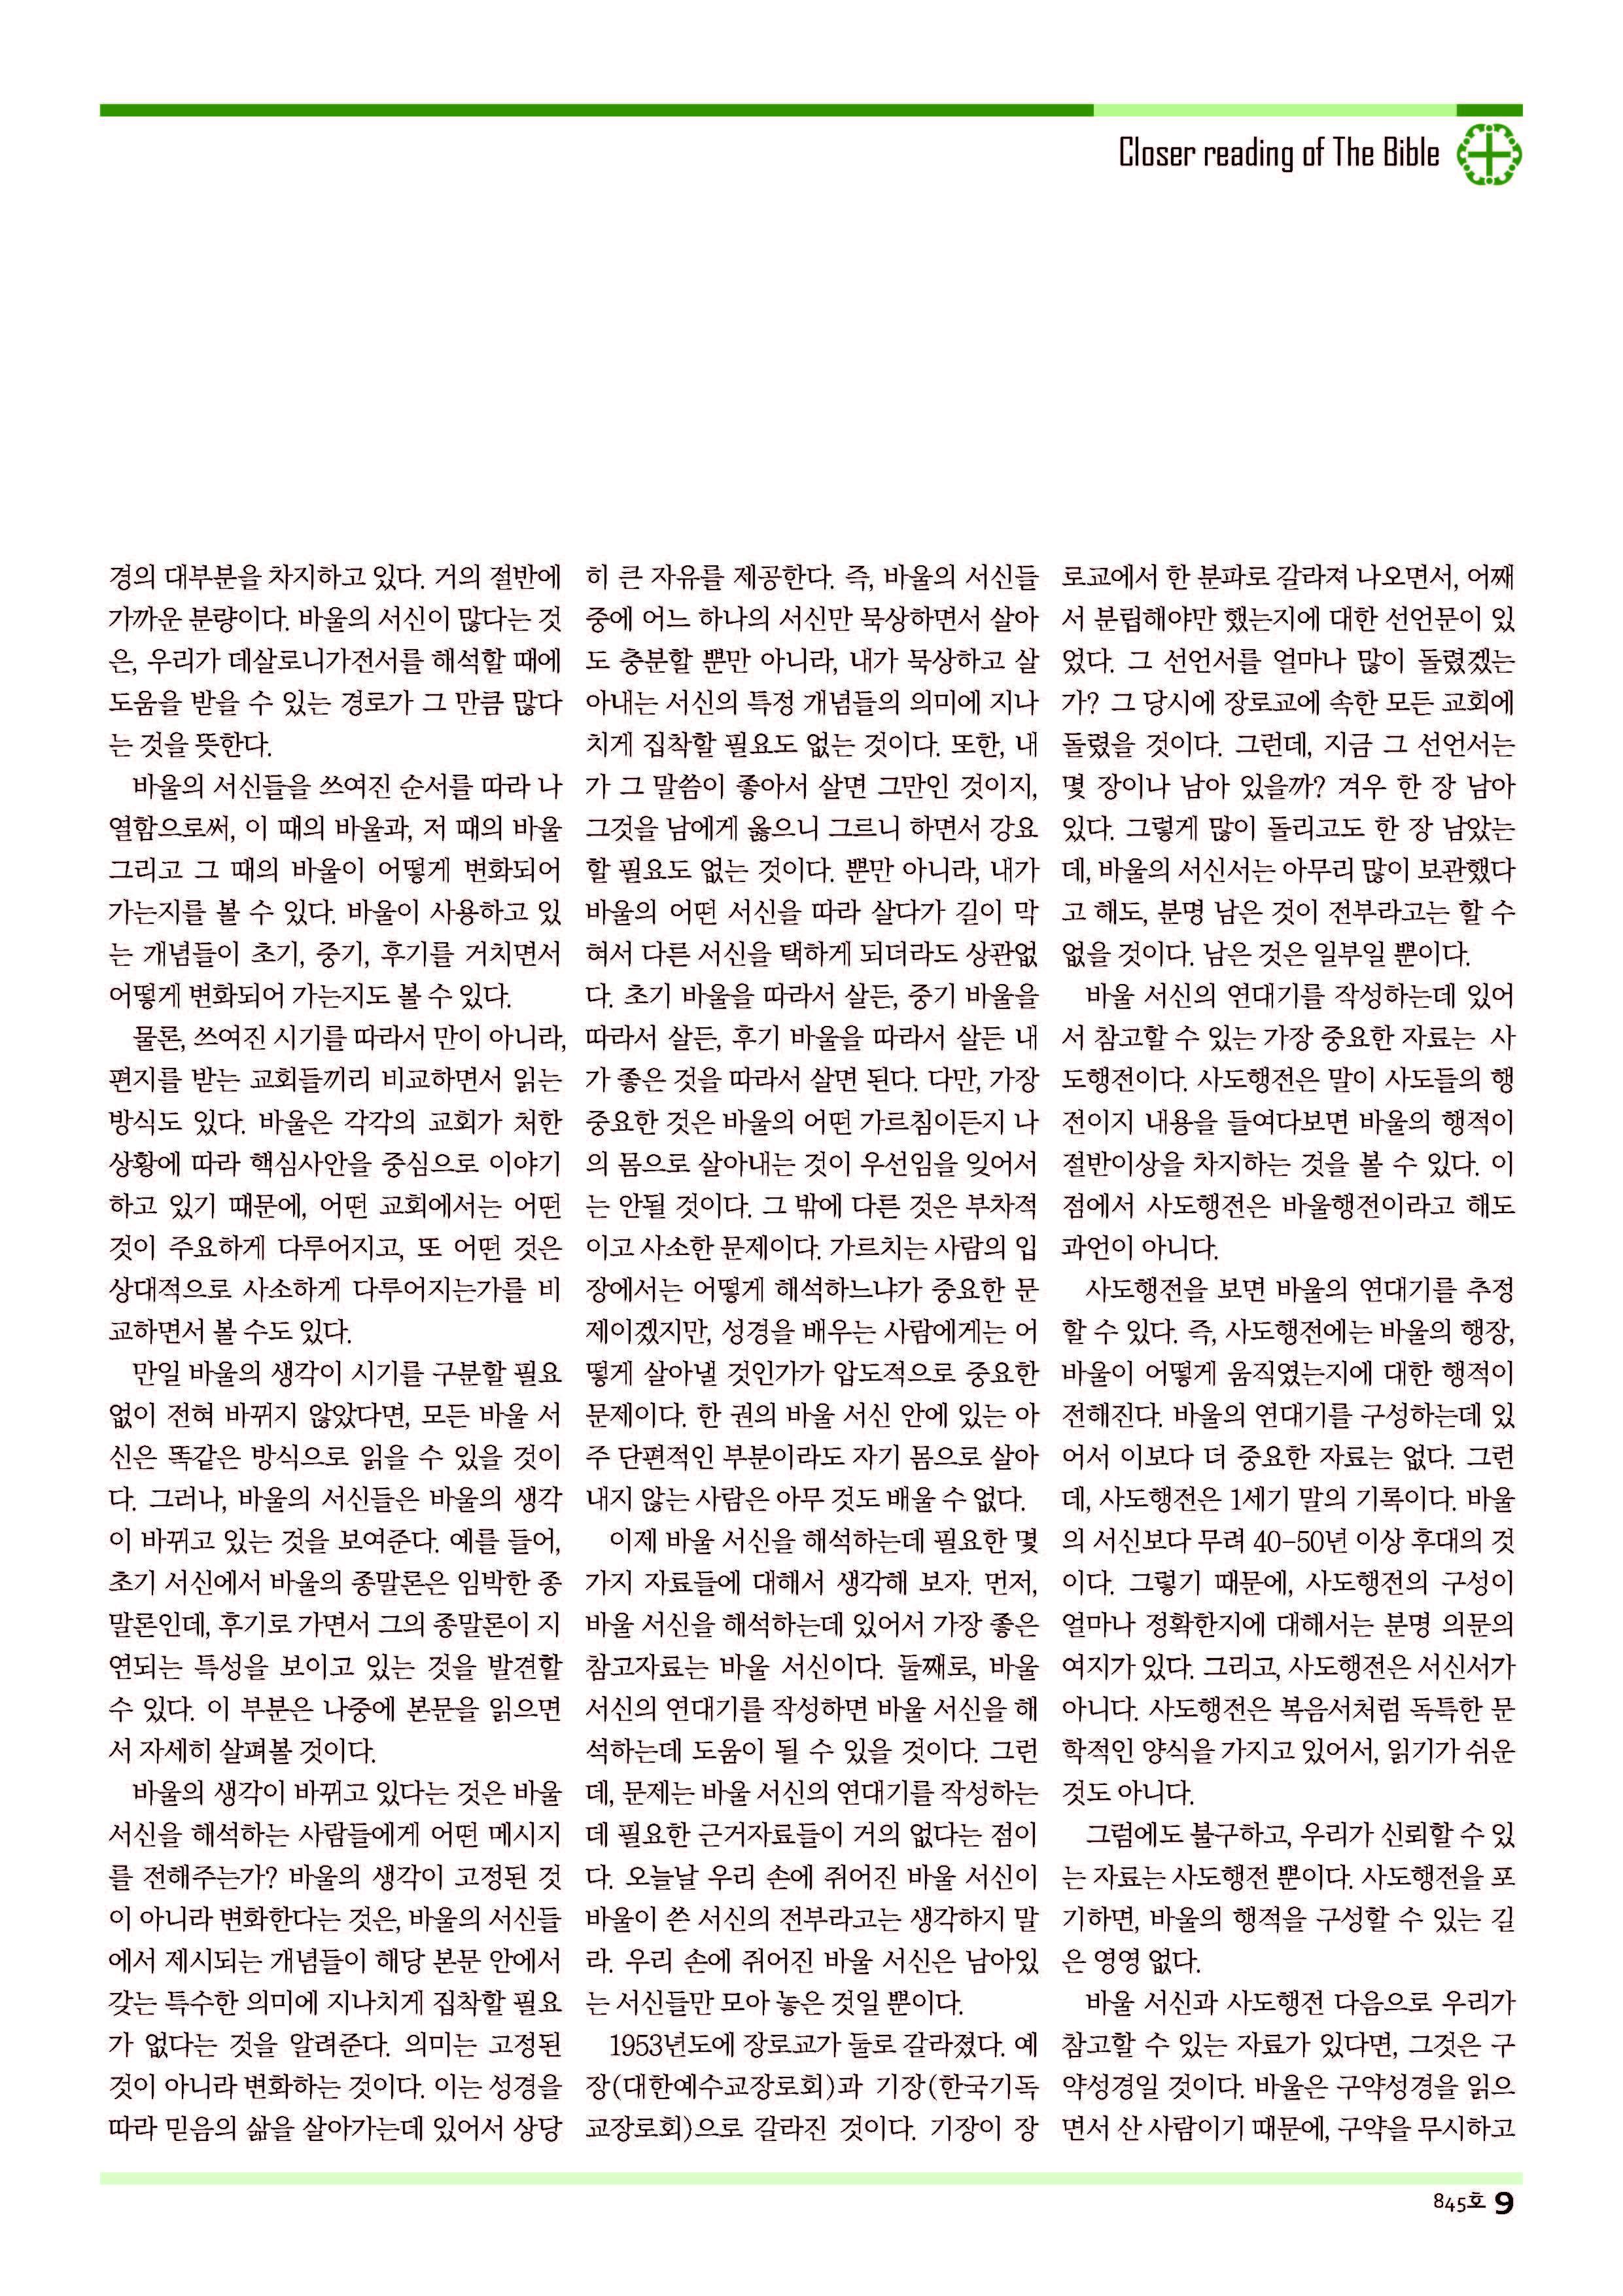 14sdjb0112_페이지_09.jpg